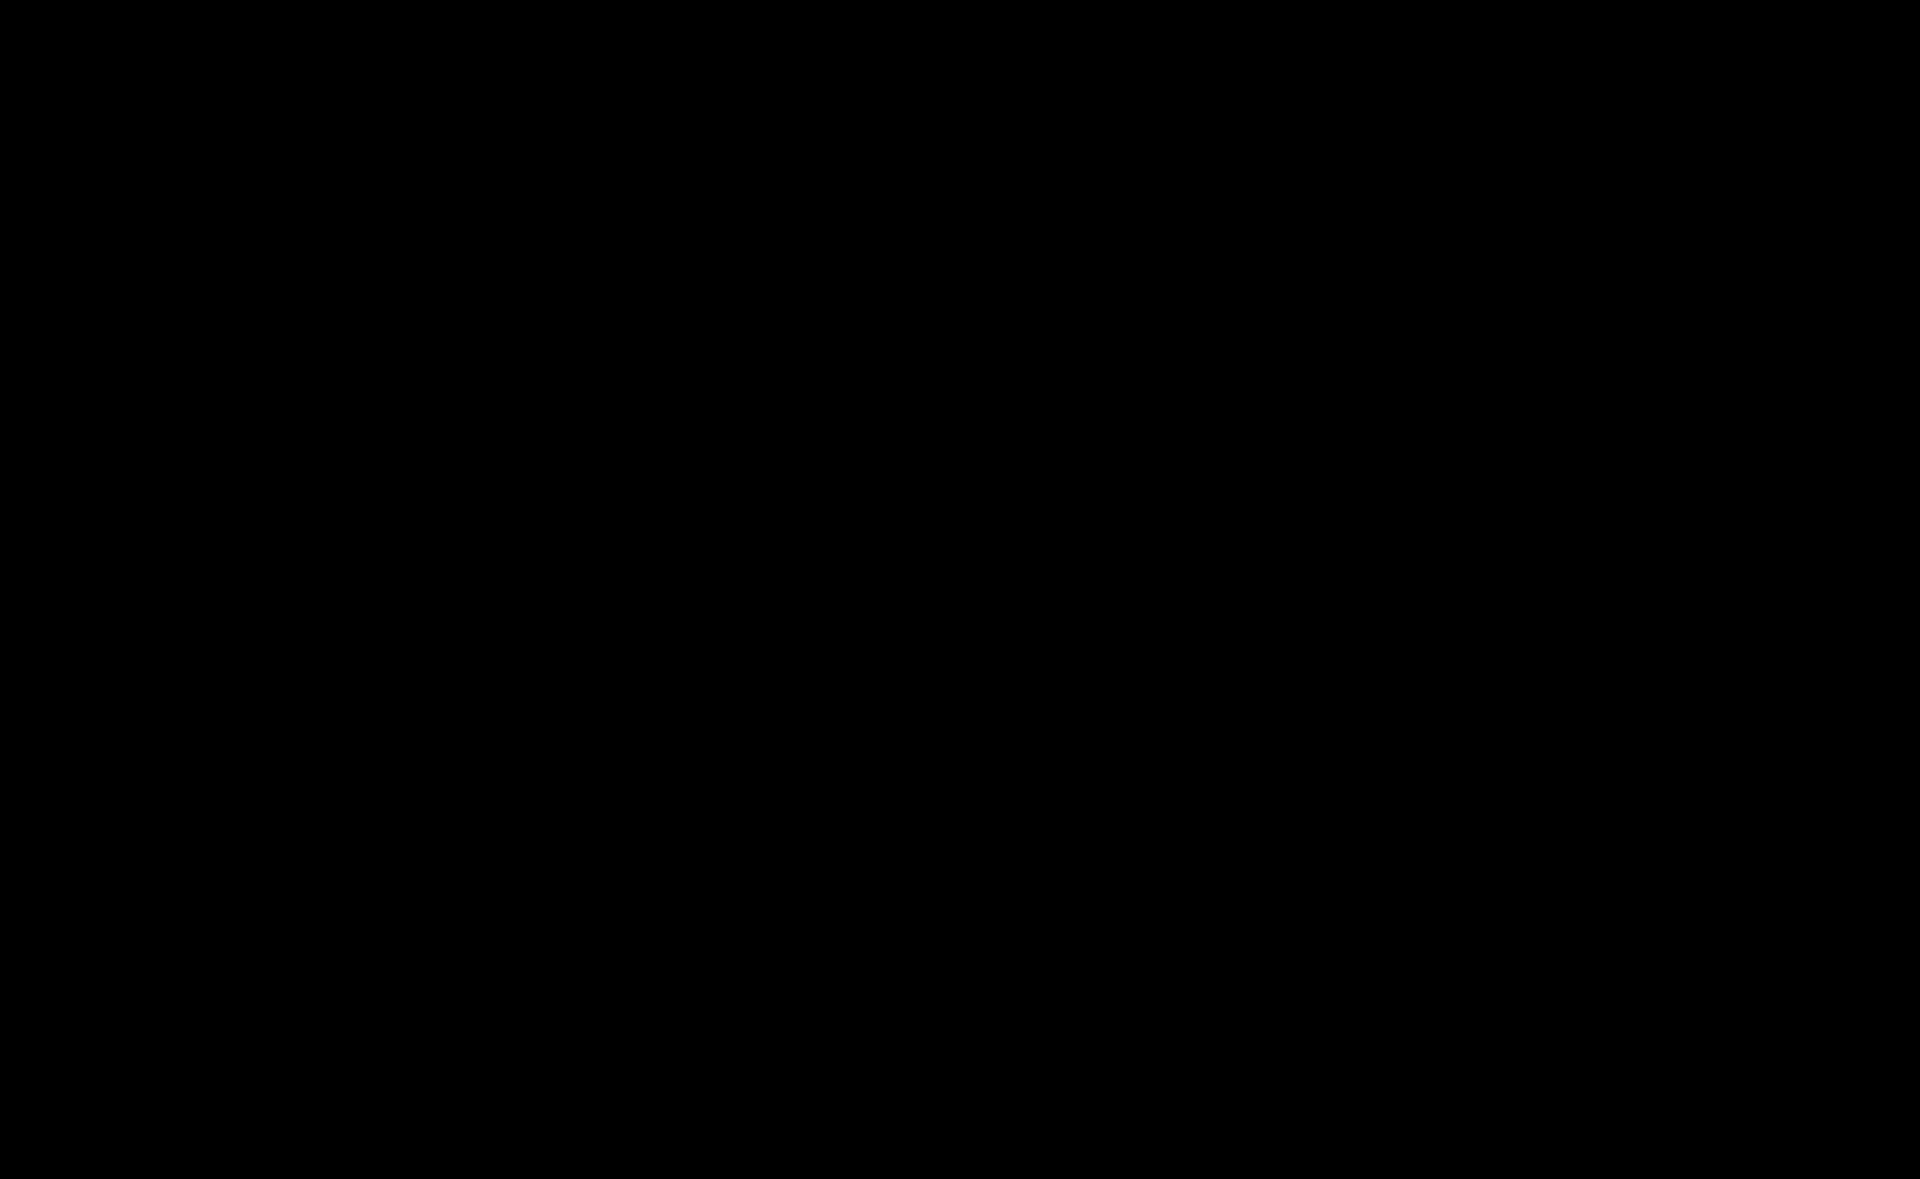 Raumspot_Herstellerlogo-Hoefats